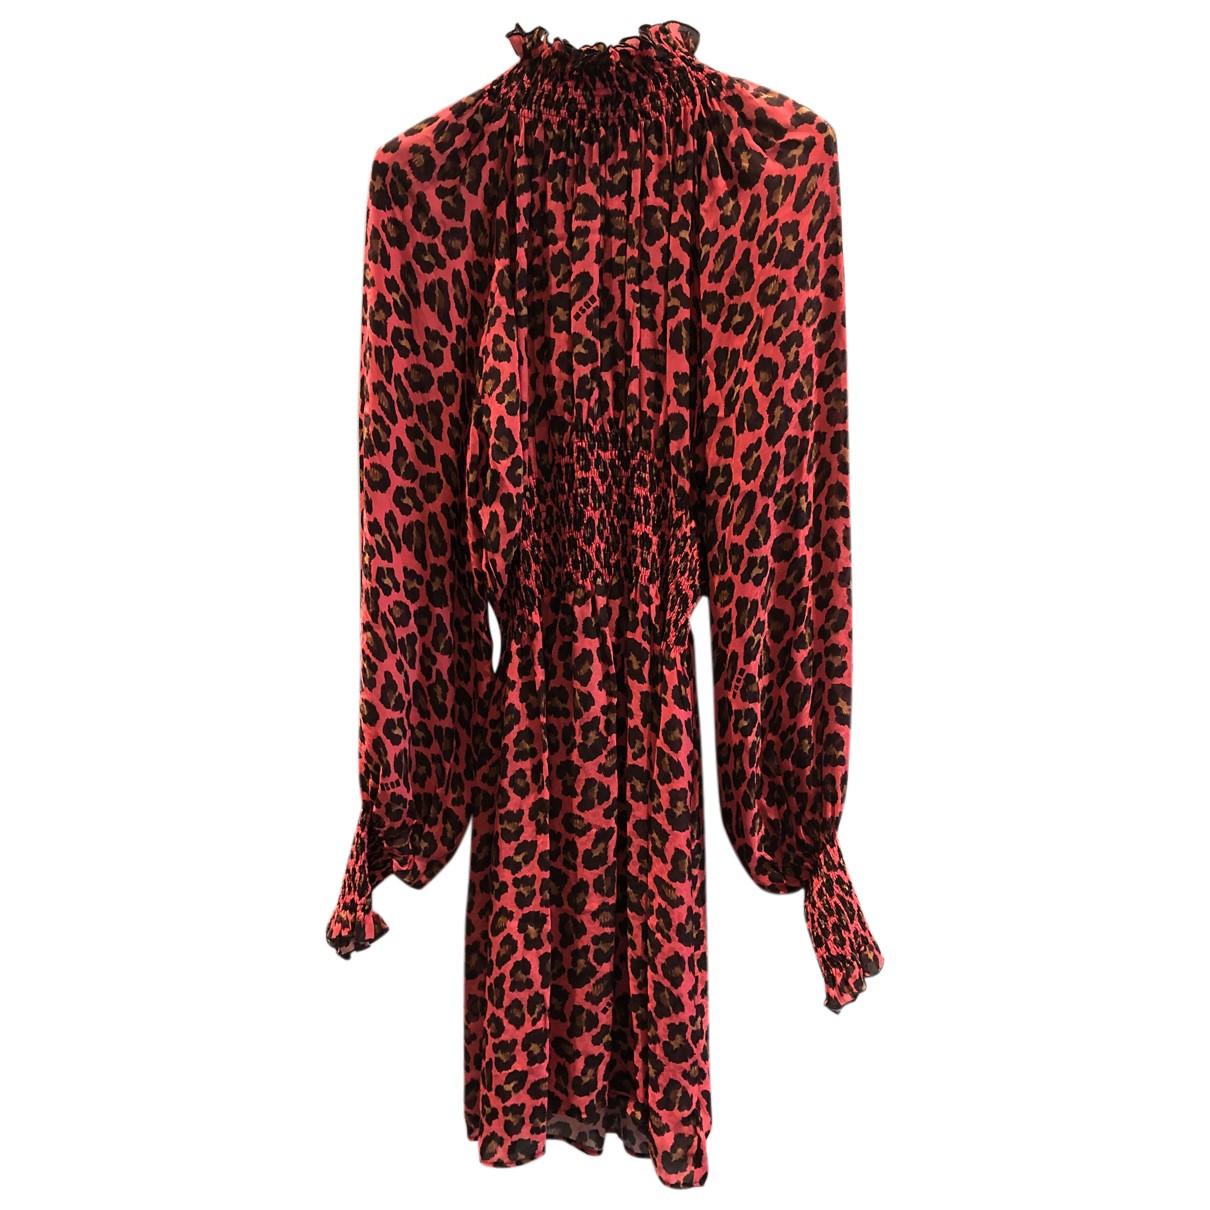 Msgm N Multicolour dress for Women 40 IT